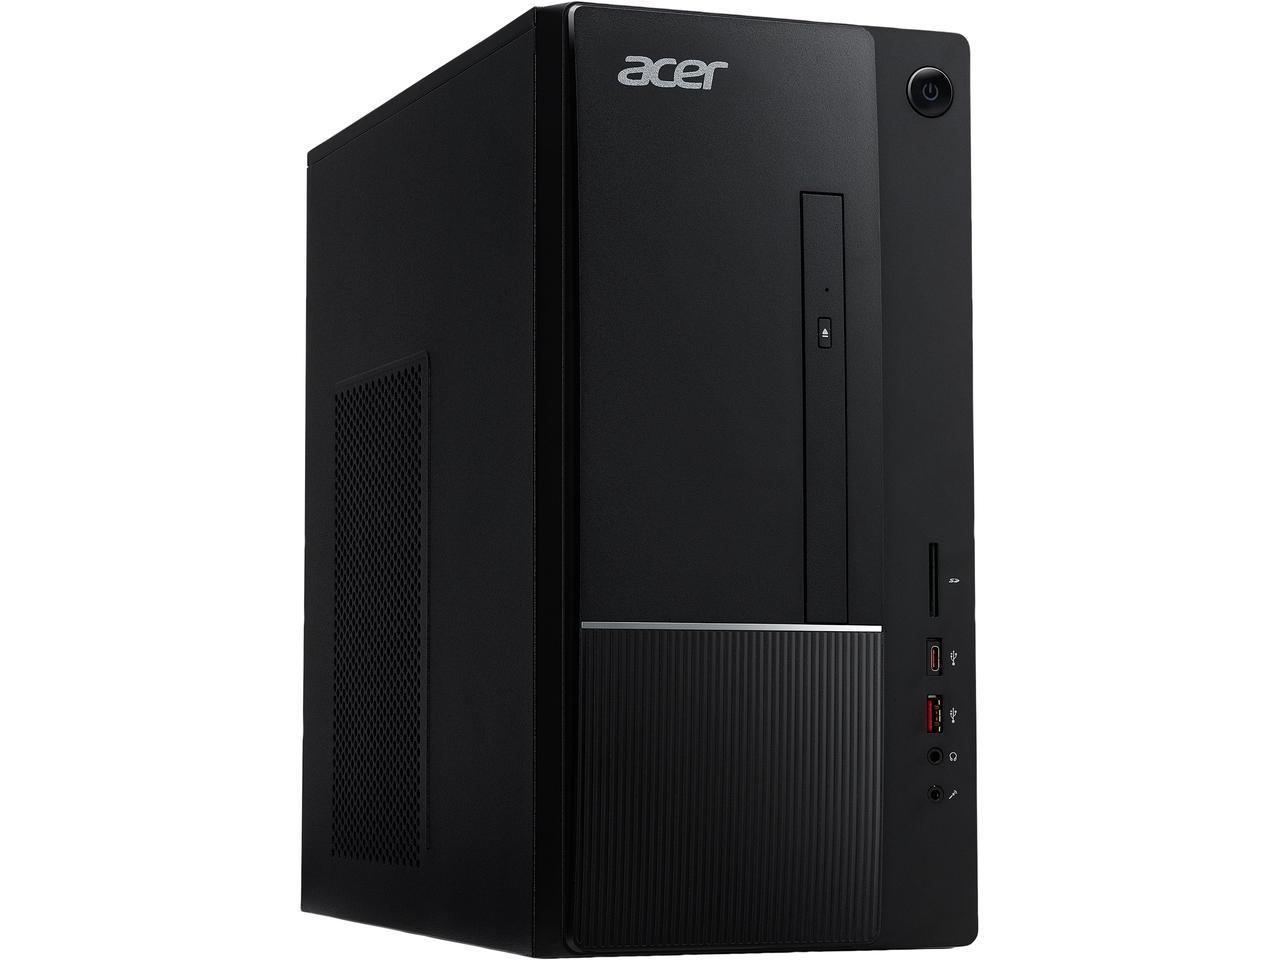 Acer Aspire T TC-865 Desktop: Intel Core i3-8100, 8GB DDR4, 1TB HDD, Type-C, Win 10 $344.99 w/ Masterpass Checkout + Free Shipping @ Newegg